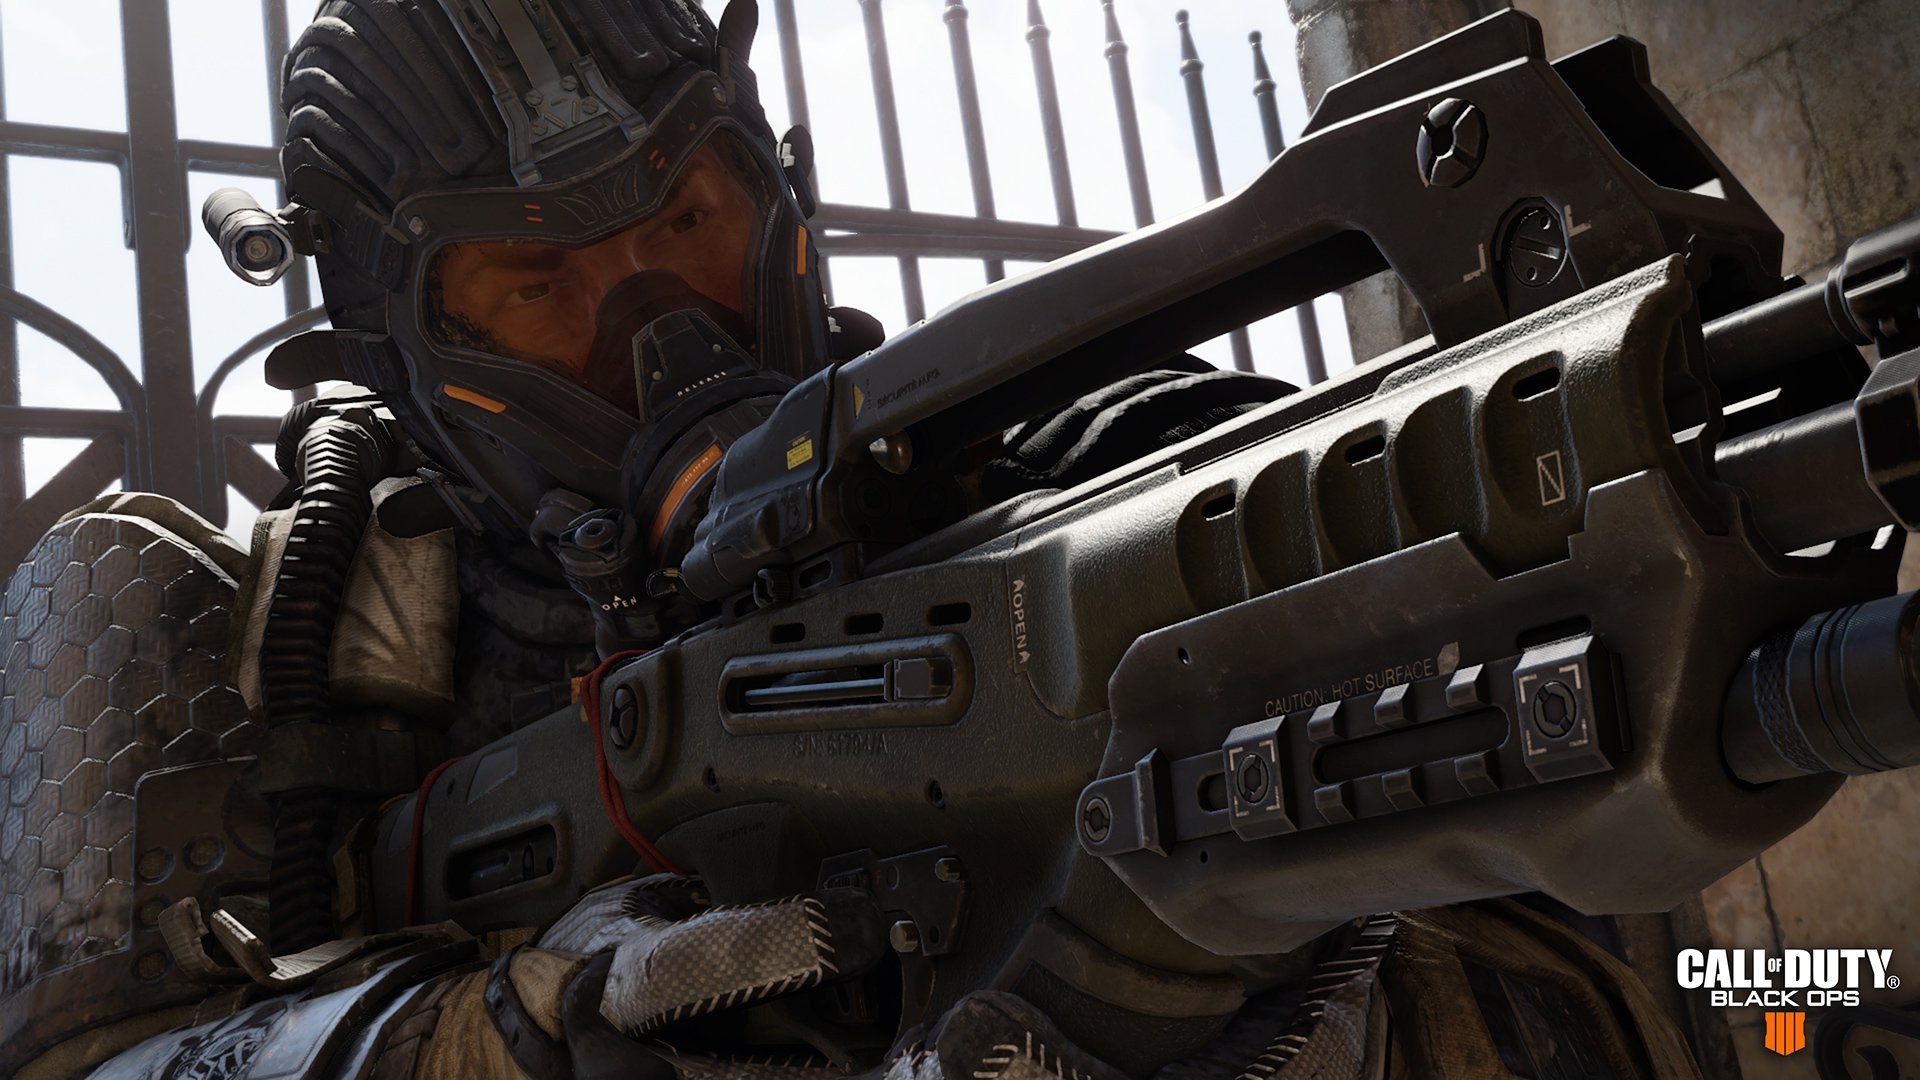 Black Ops 4 producer drops vague hints about a campaign mode screenshot